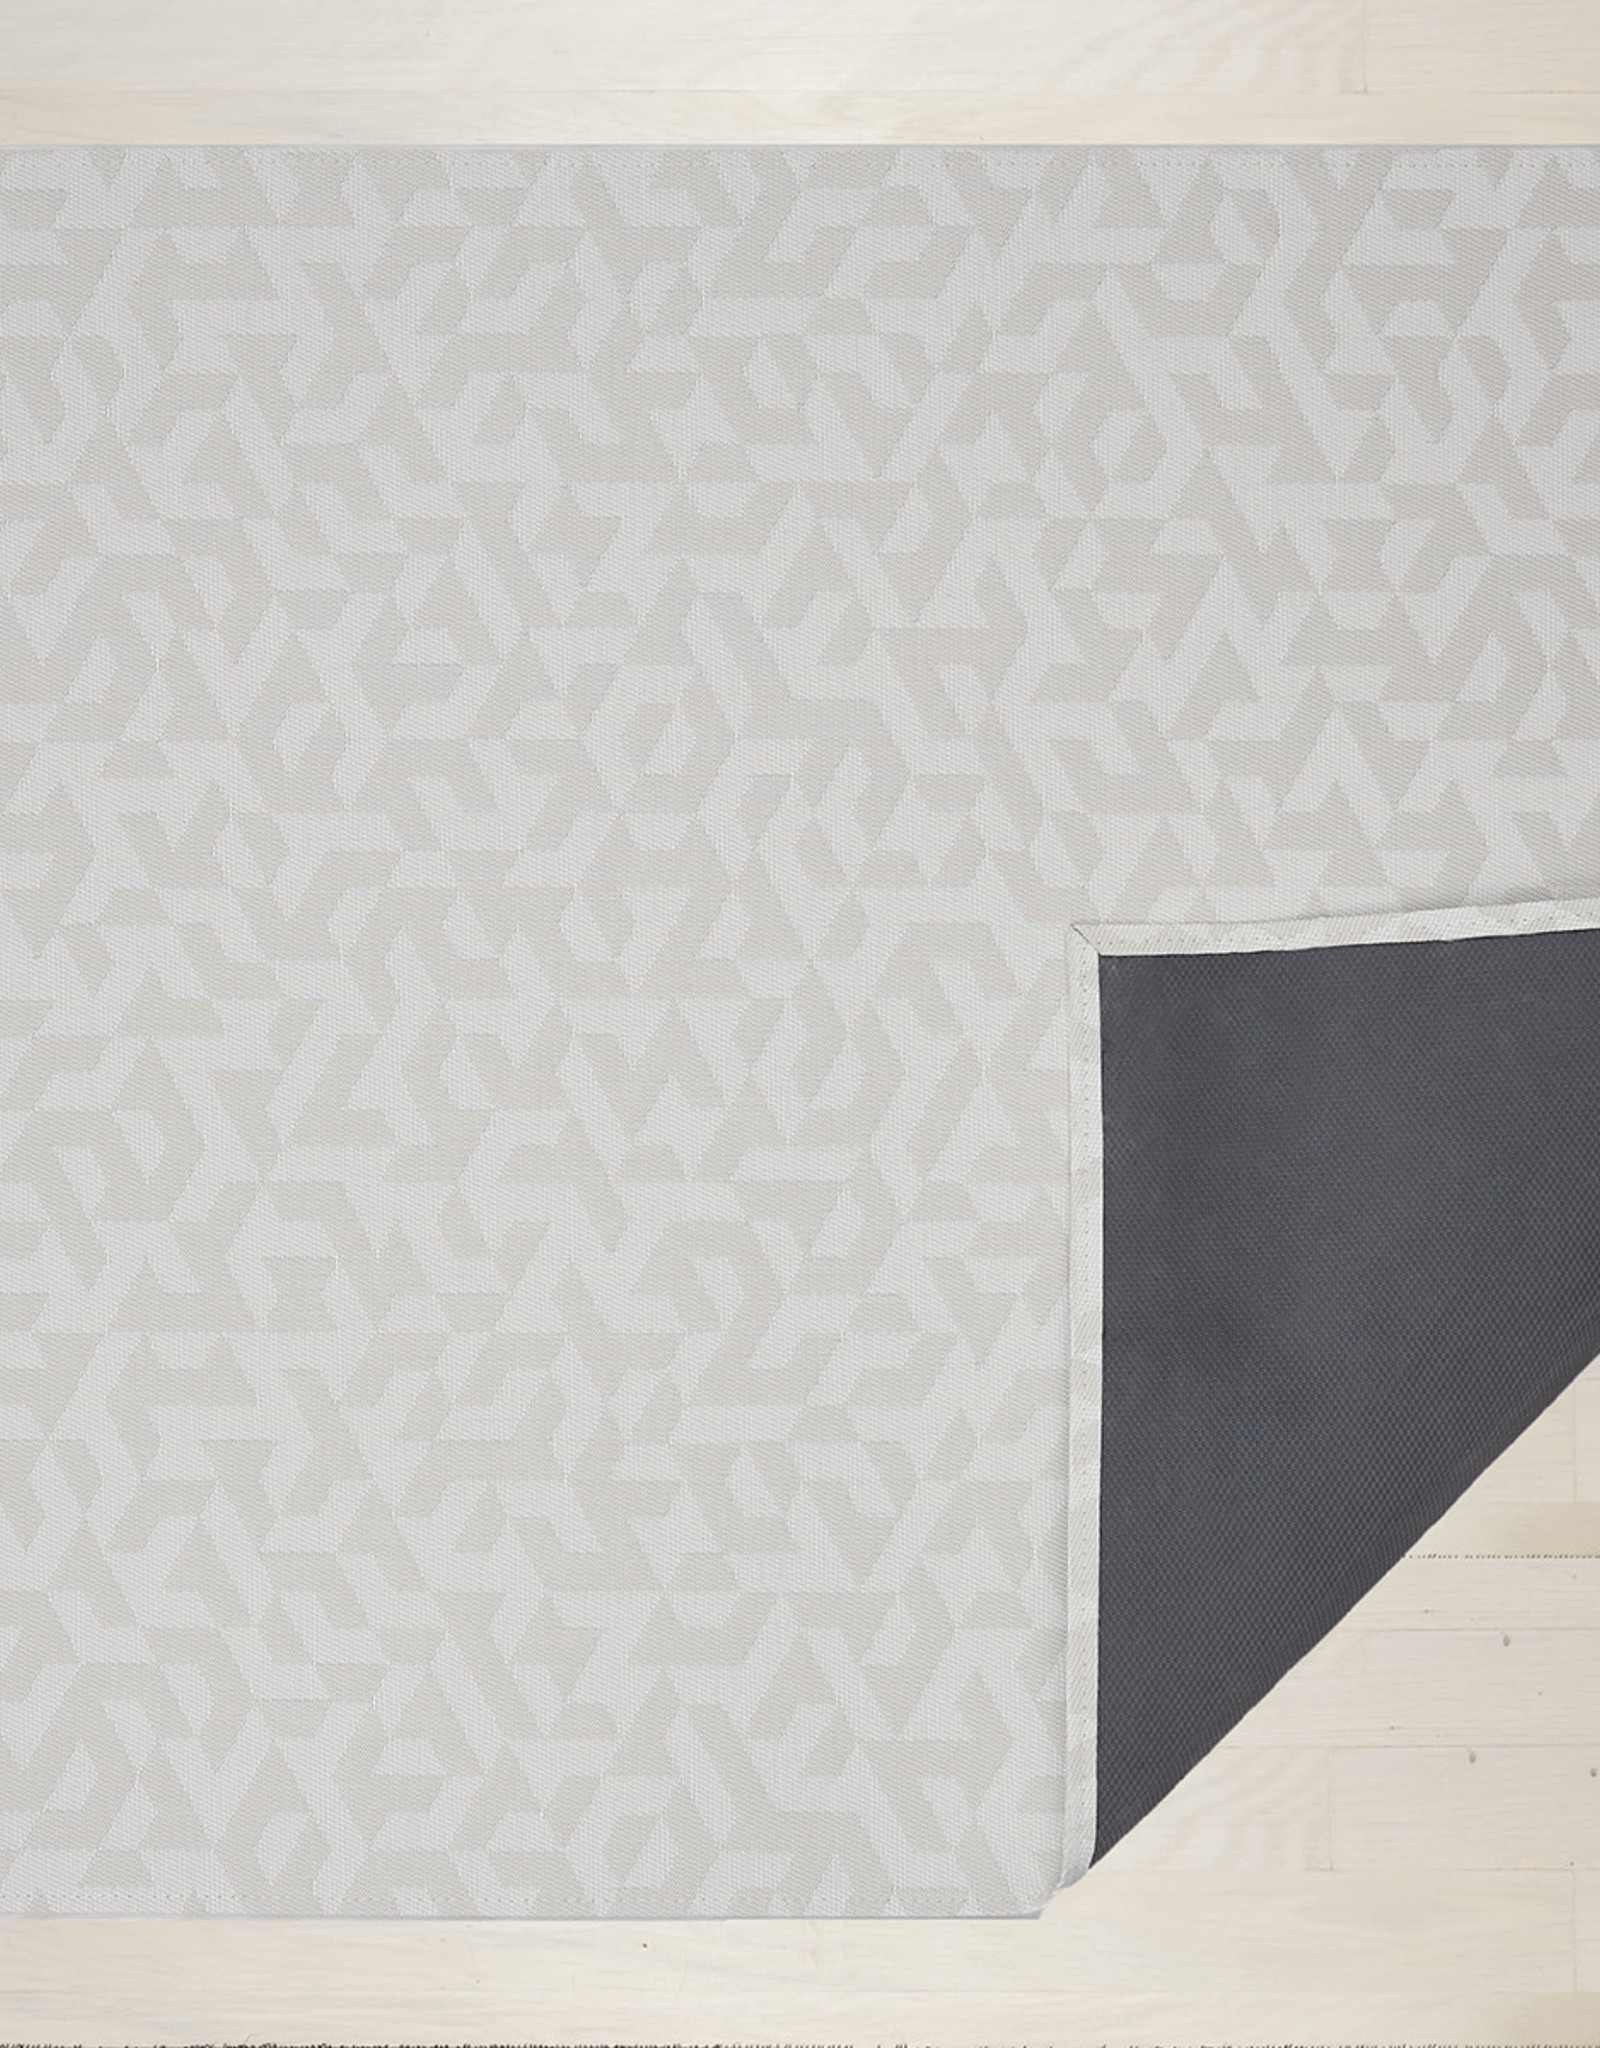 Chilewich Prism Floormat 23 x 36, NATURAL